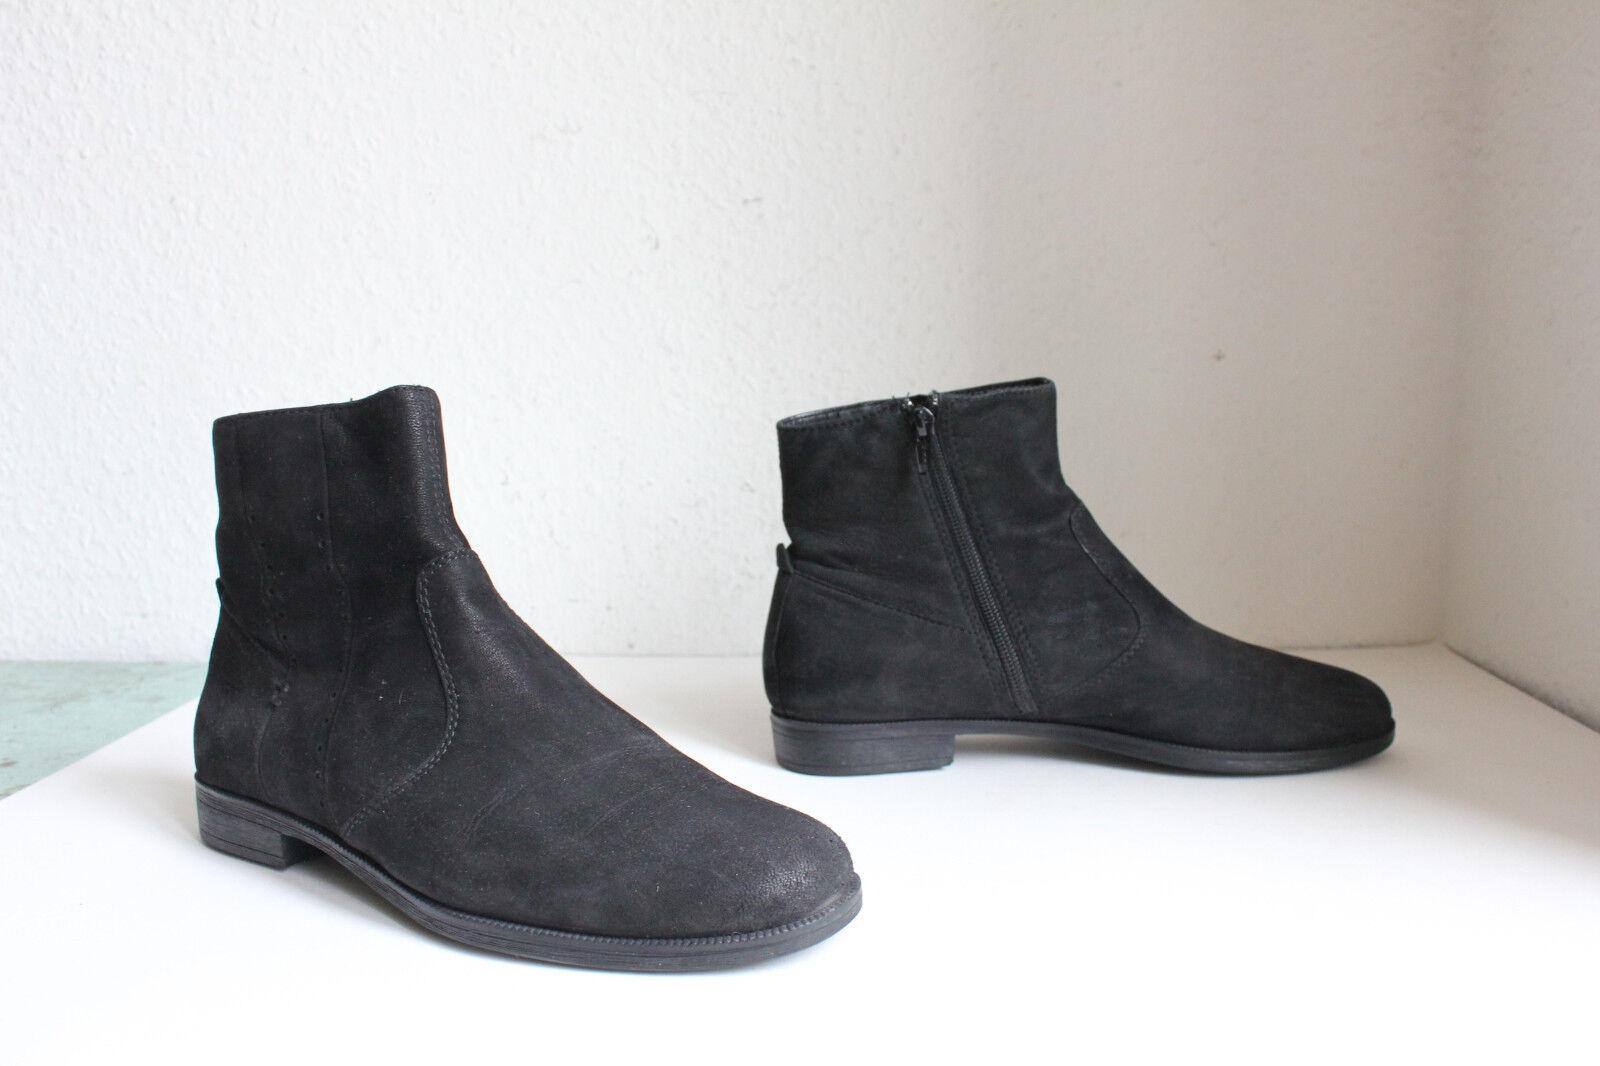 Vagabond Elegante Stiefel Stiefeletten Stiefel Elegante Echteder Schwarz Eu:40 e0e269